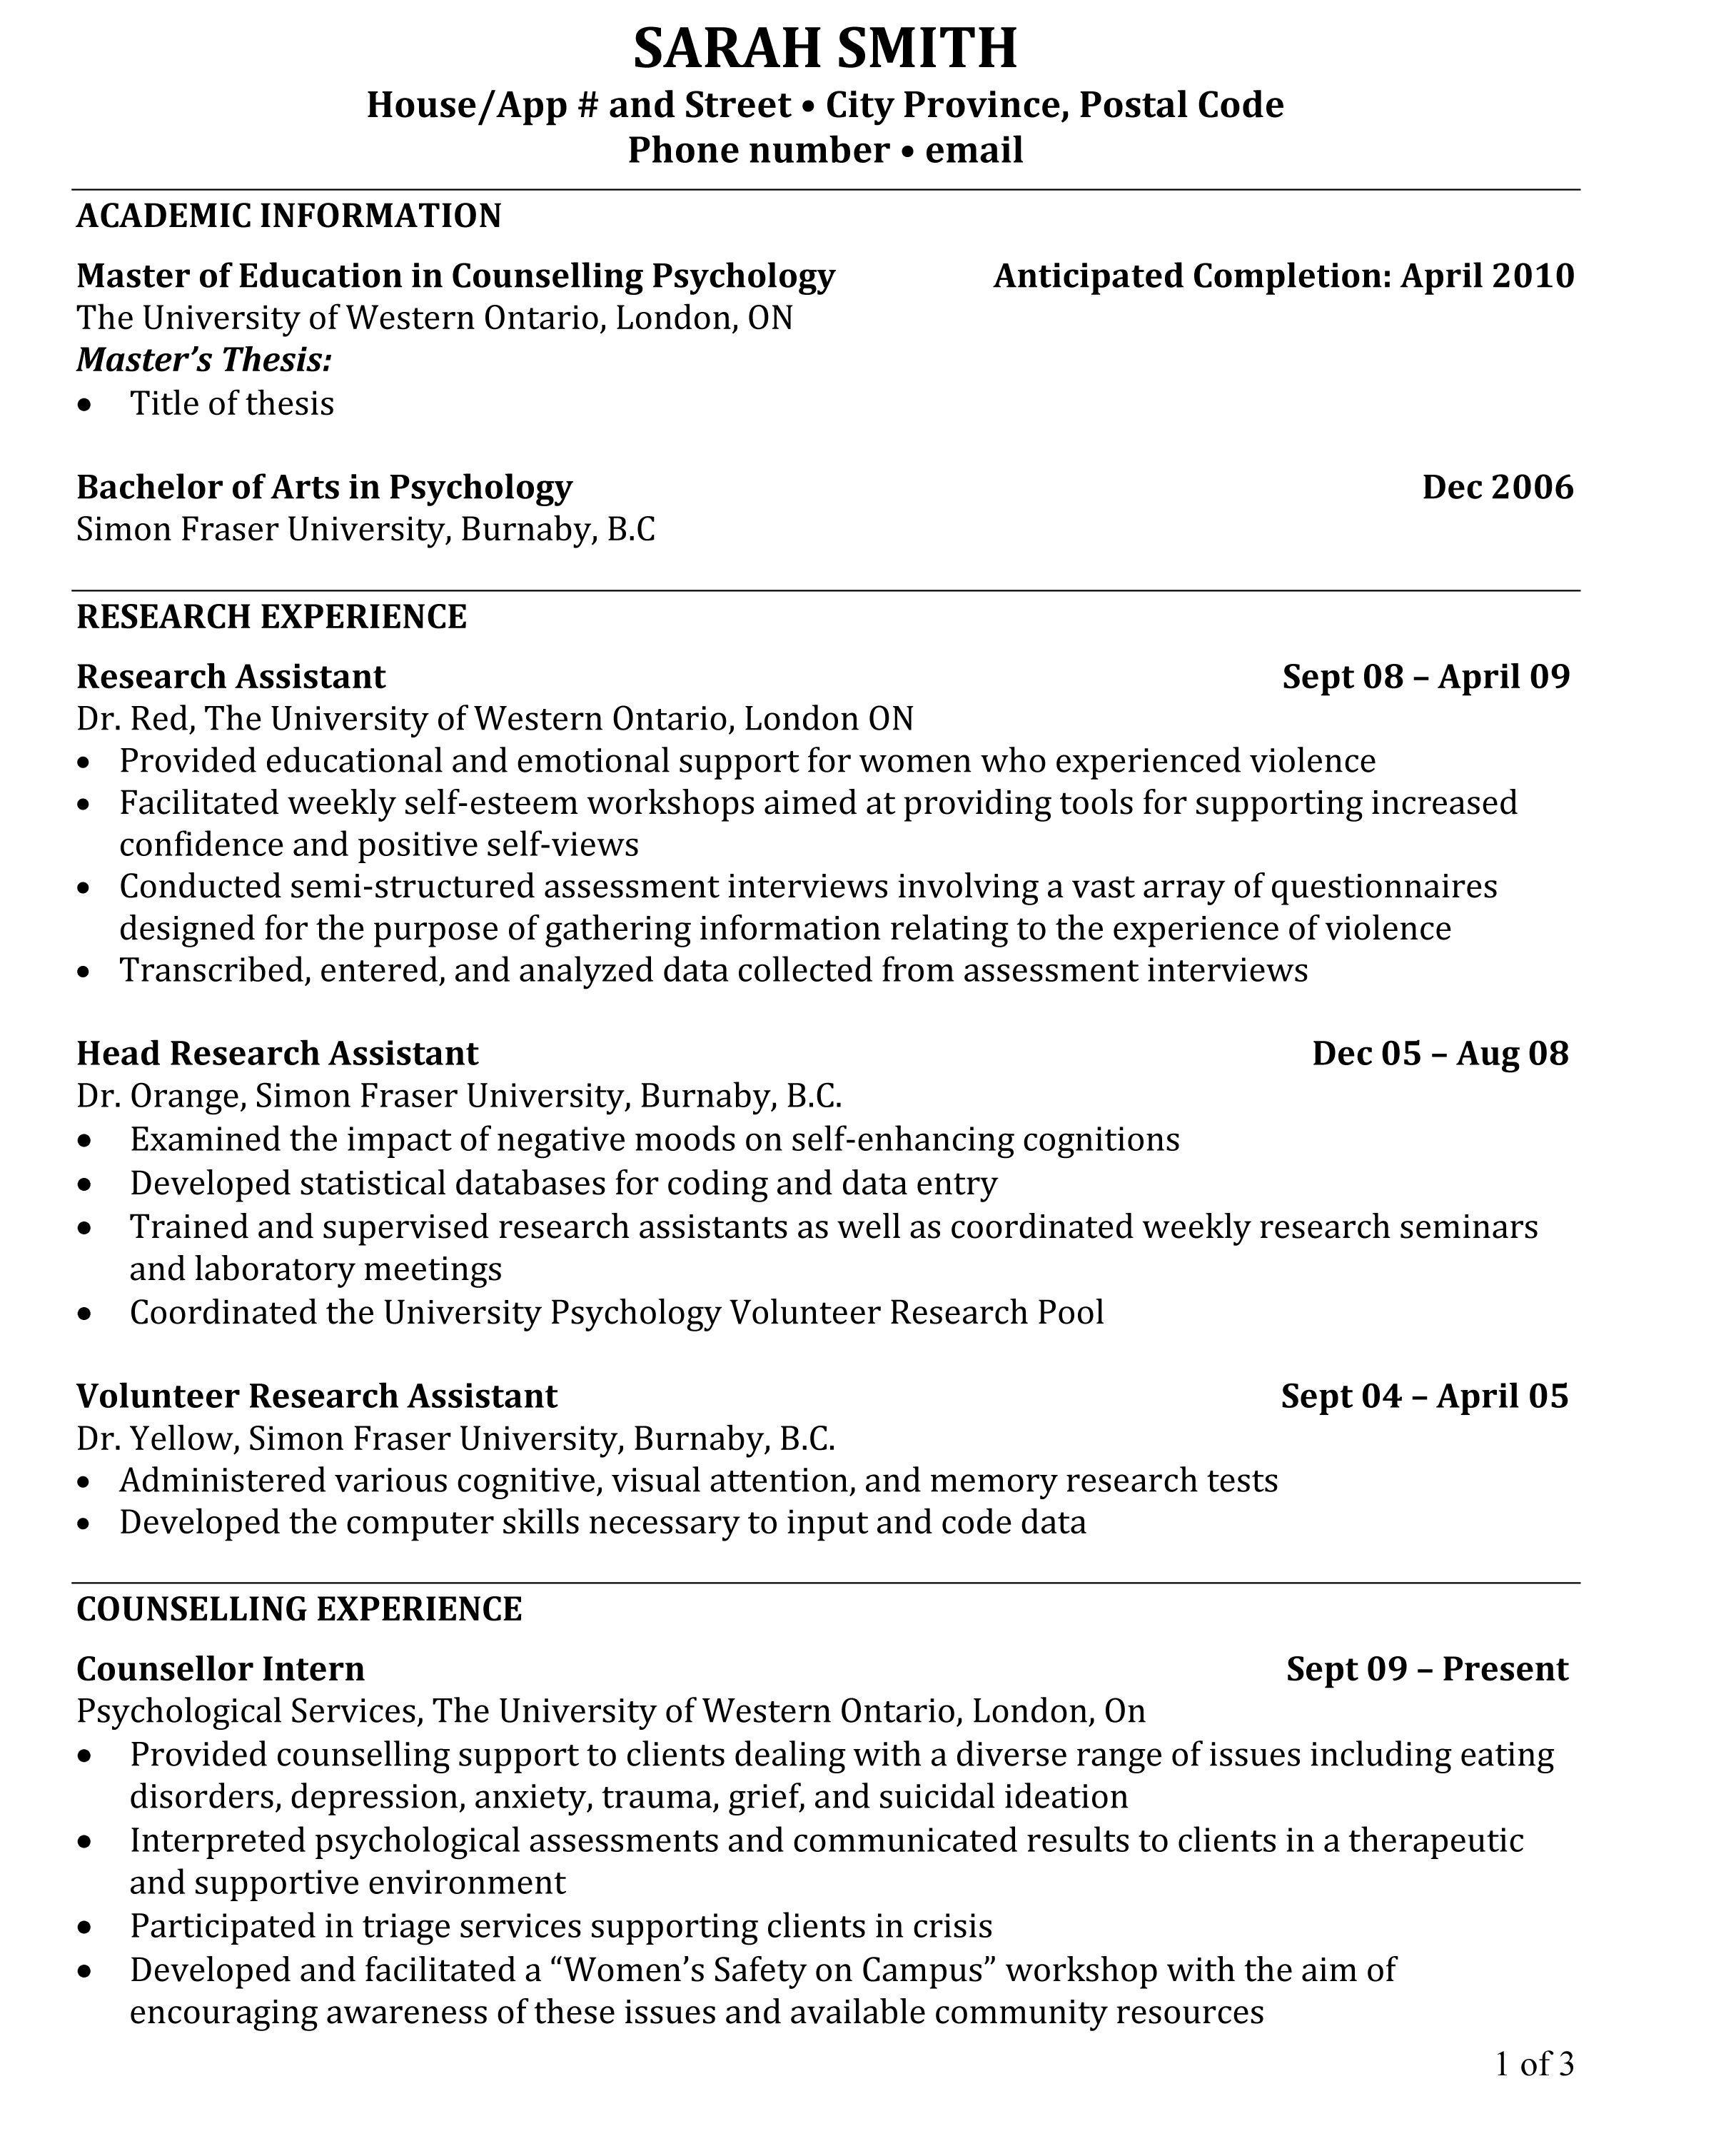 Student resume template, Student resume, Academic cv